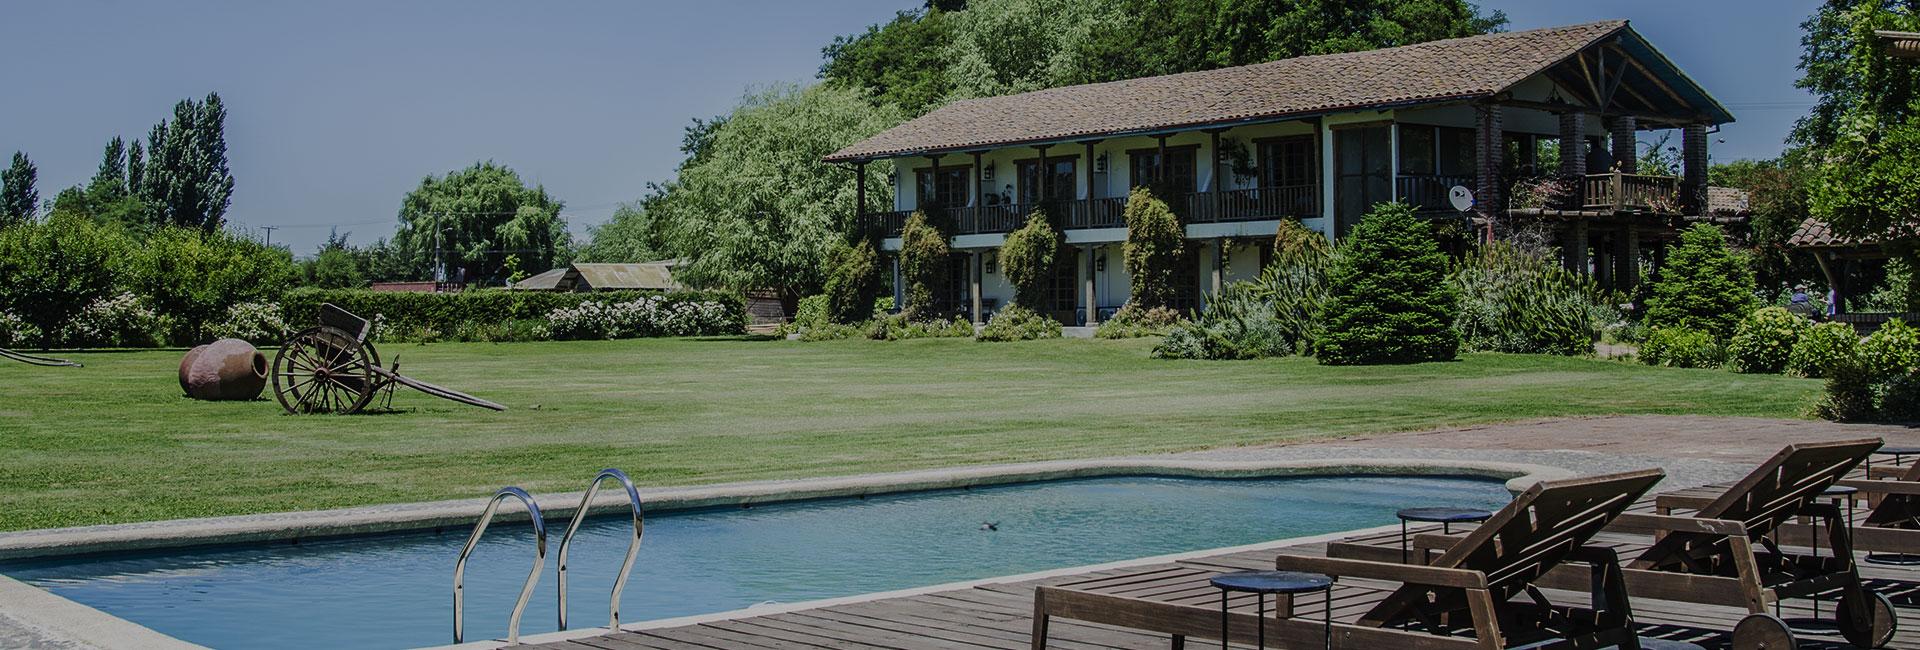 Hotel Casa de Campo pool and exterior